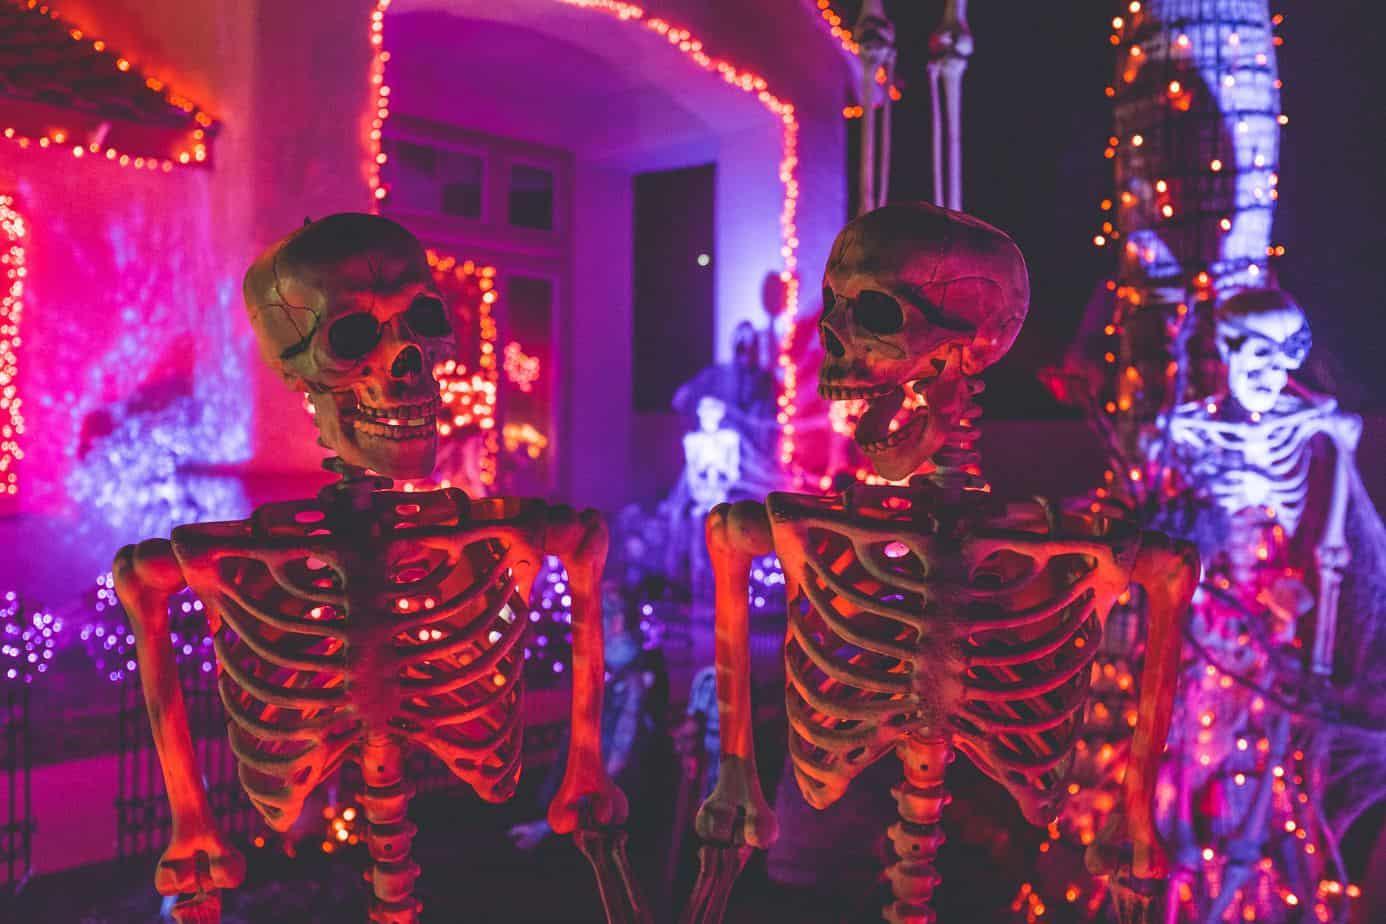 Halloween Lighting Ideas for 2019